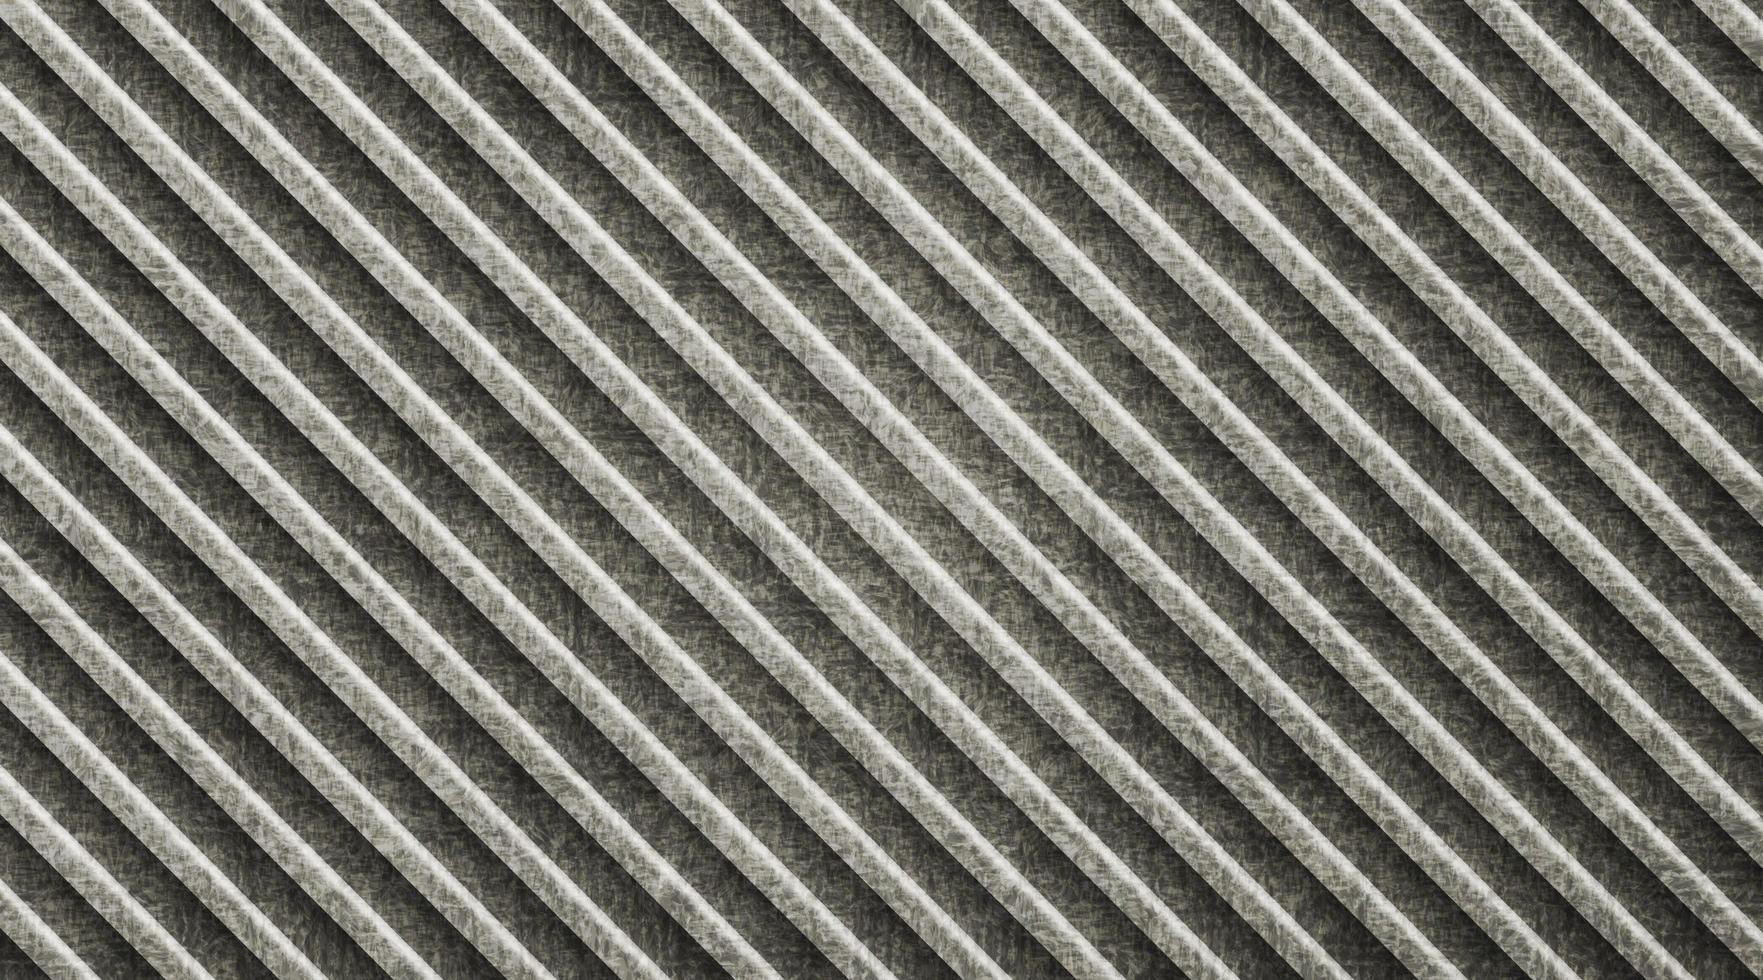 vettore sfondo argento metallo e acciaio